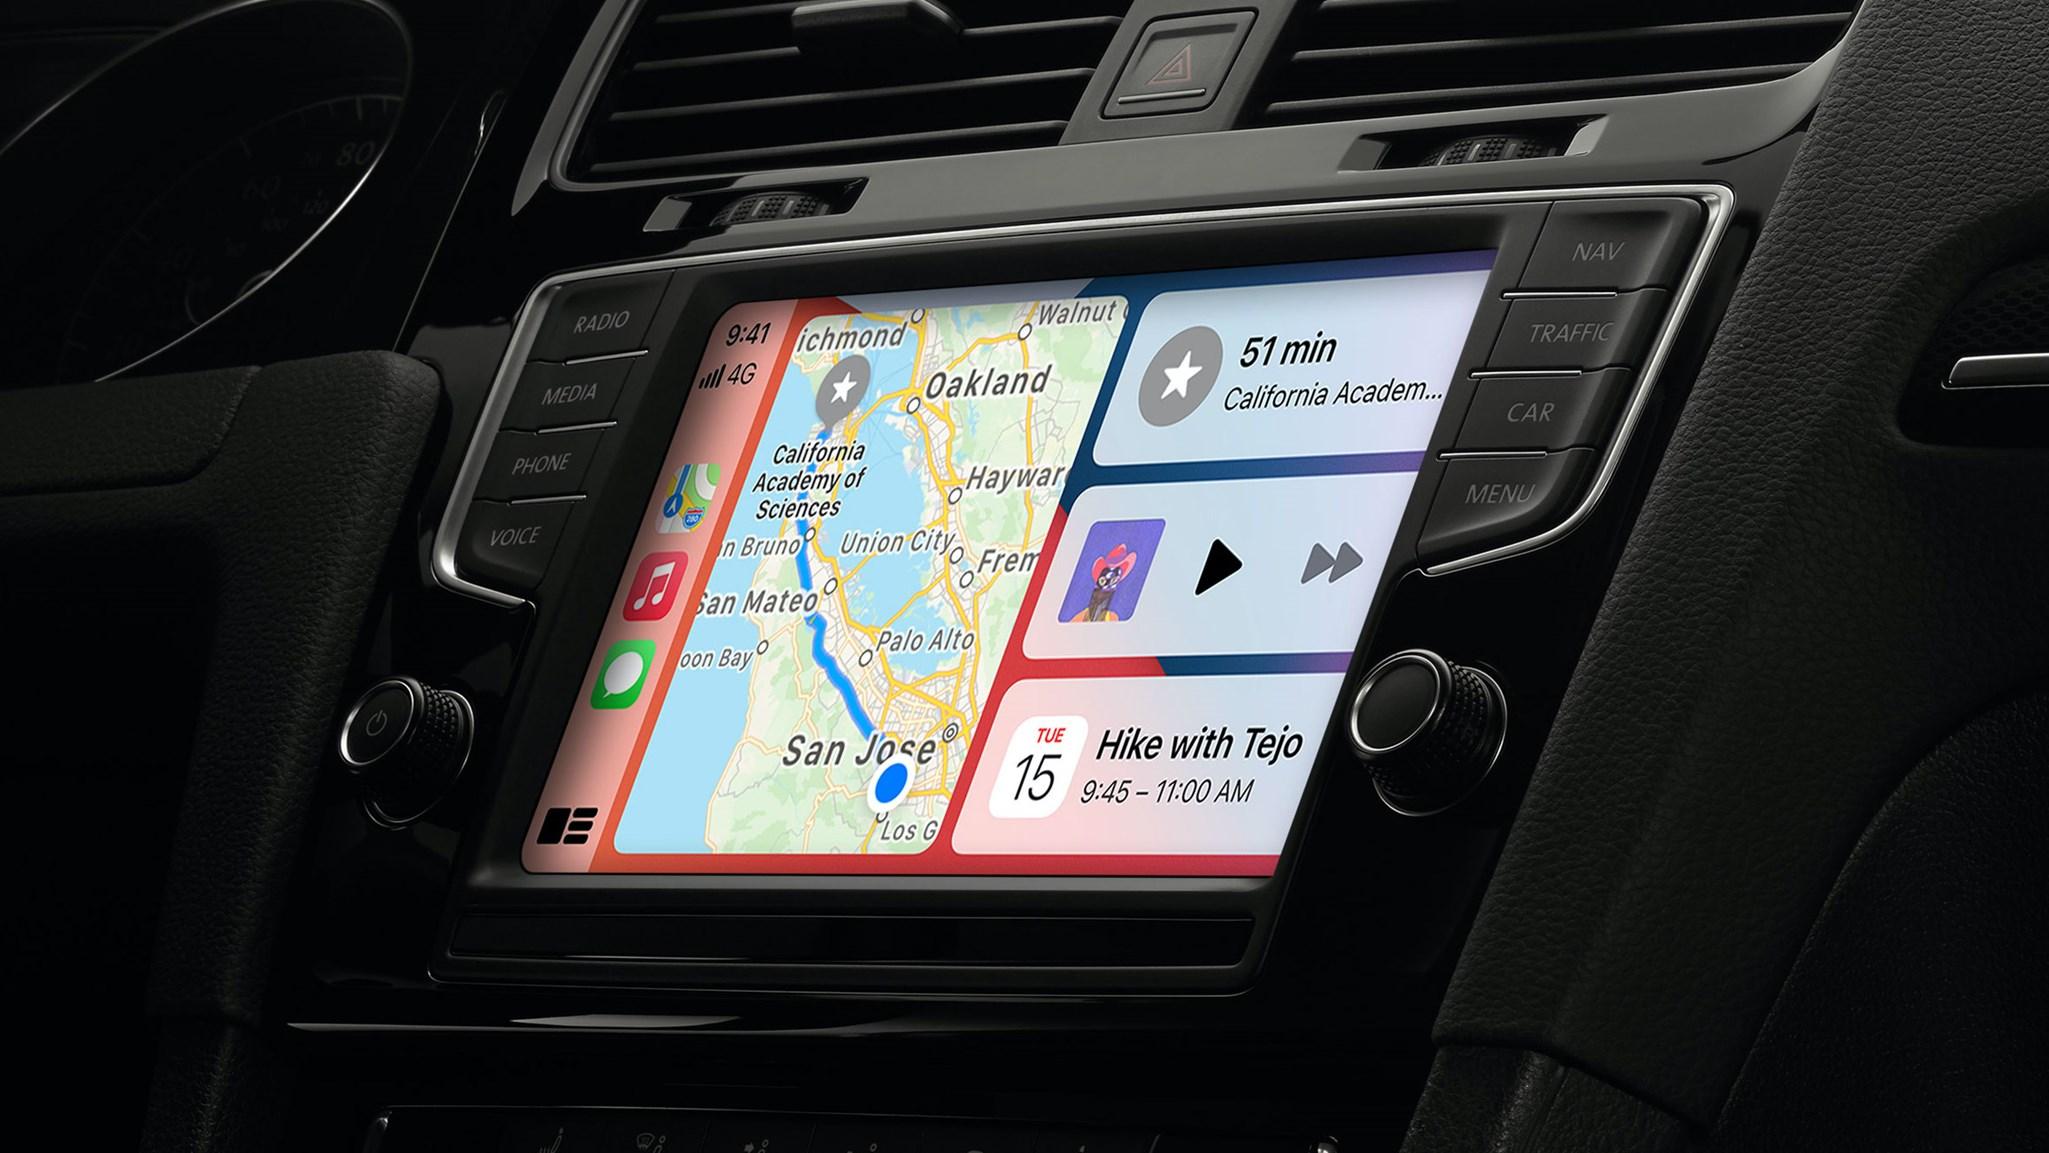 Apple updates iOS 14 with CarPlay enhancements